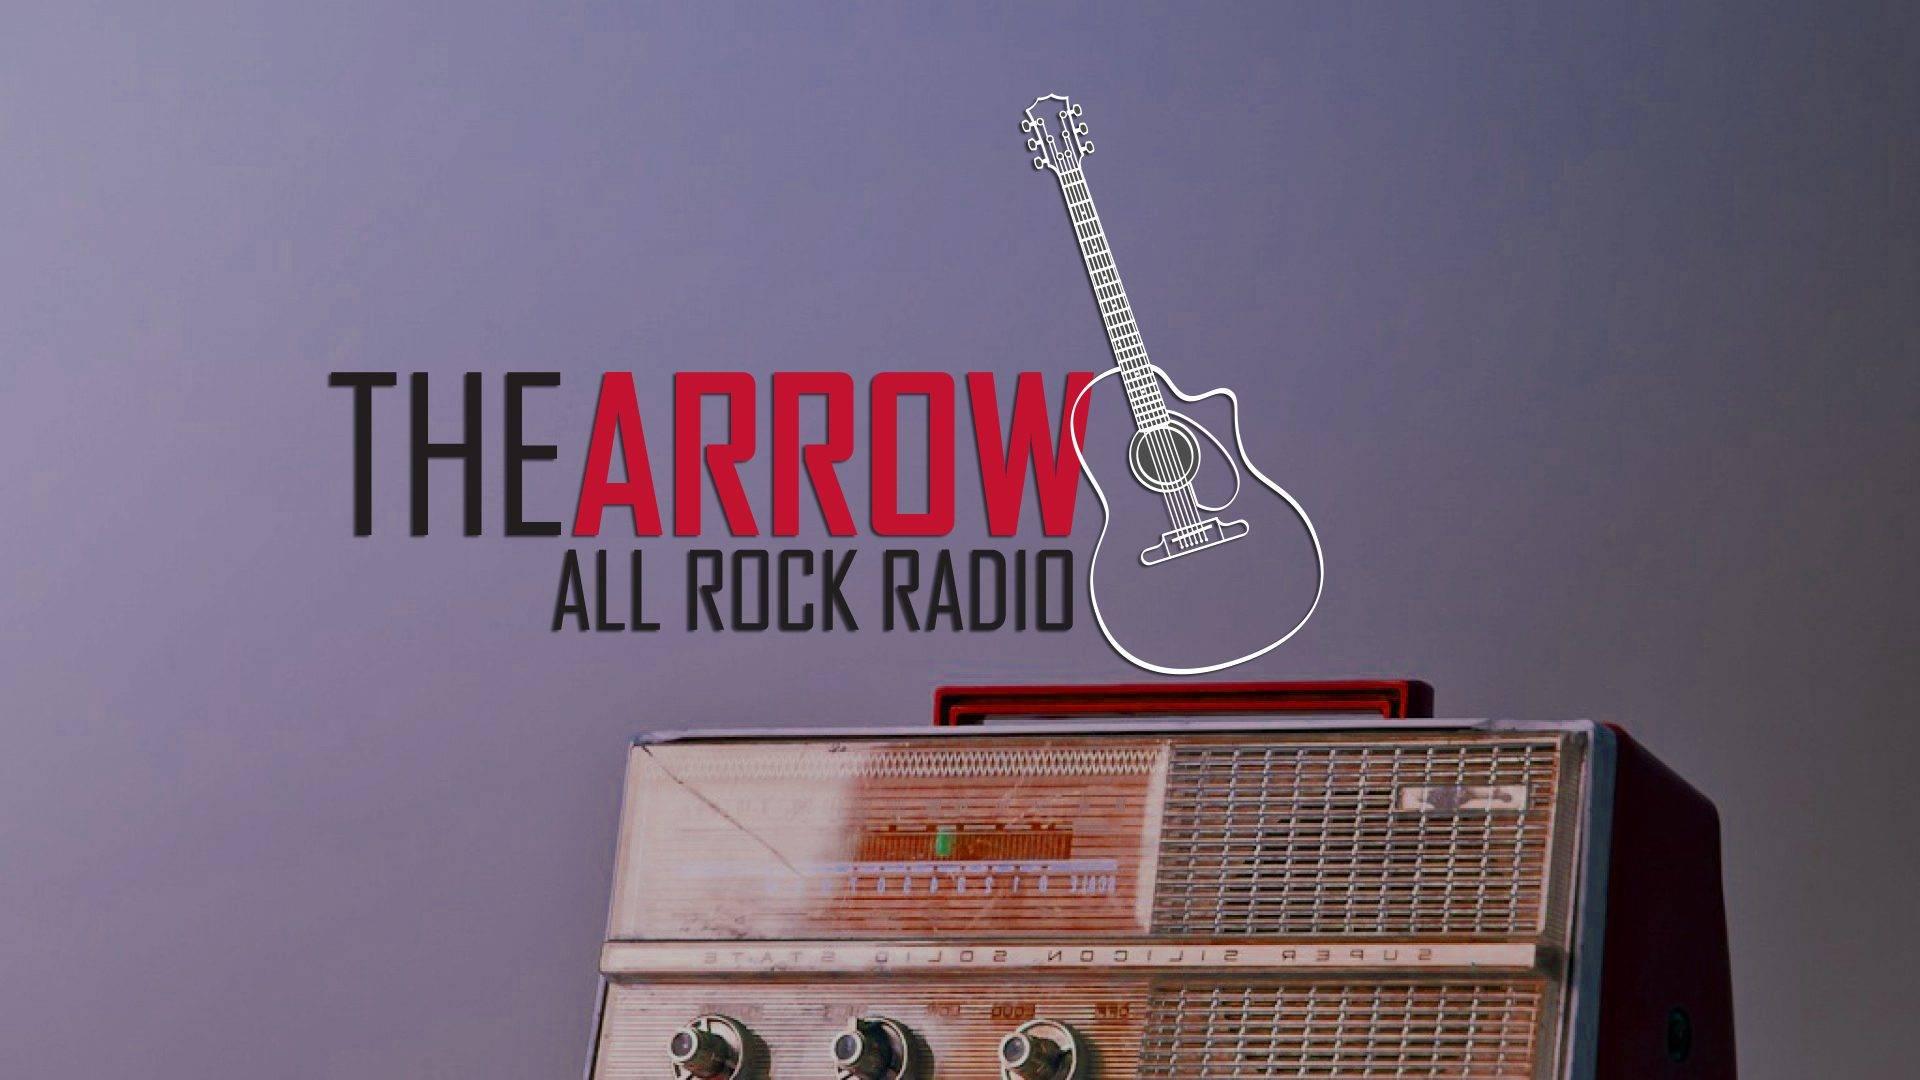 The Arrow All Rock Radio